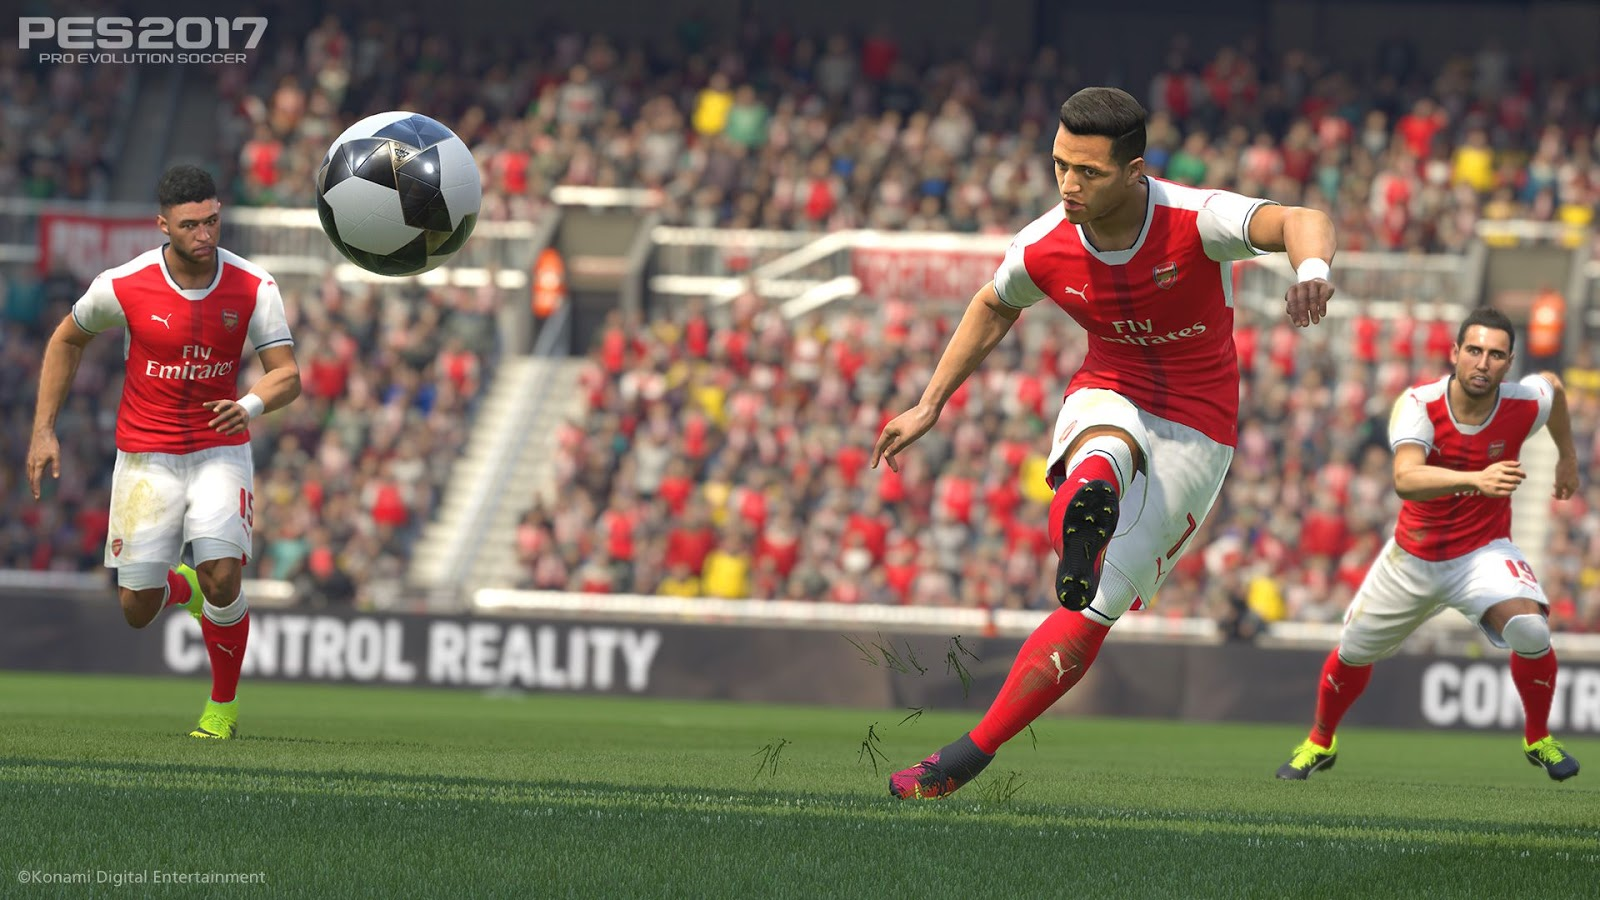 PES 2017 Slower Legacy Gameplay dari Parham 8   Patch PES Terbaru